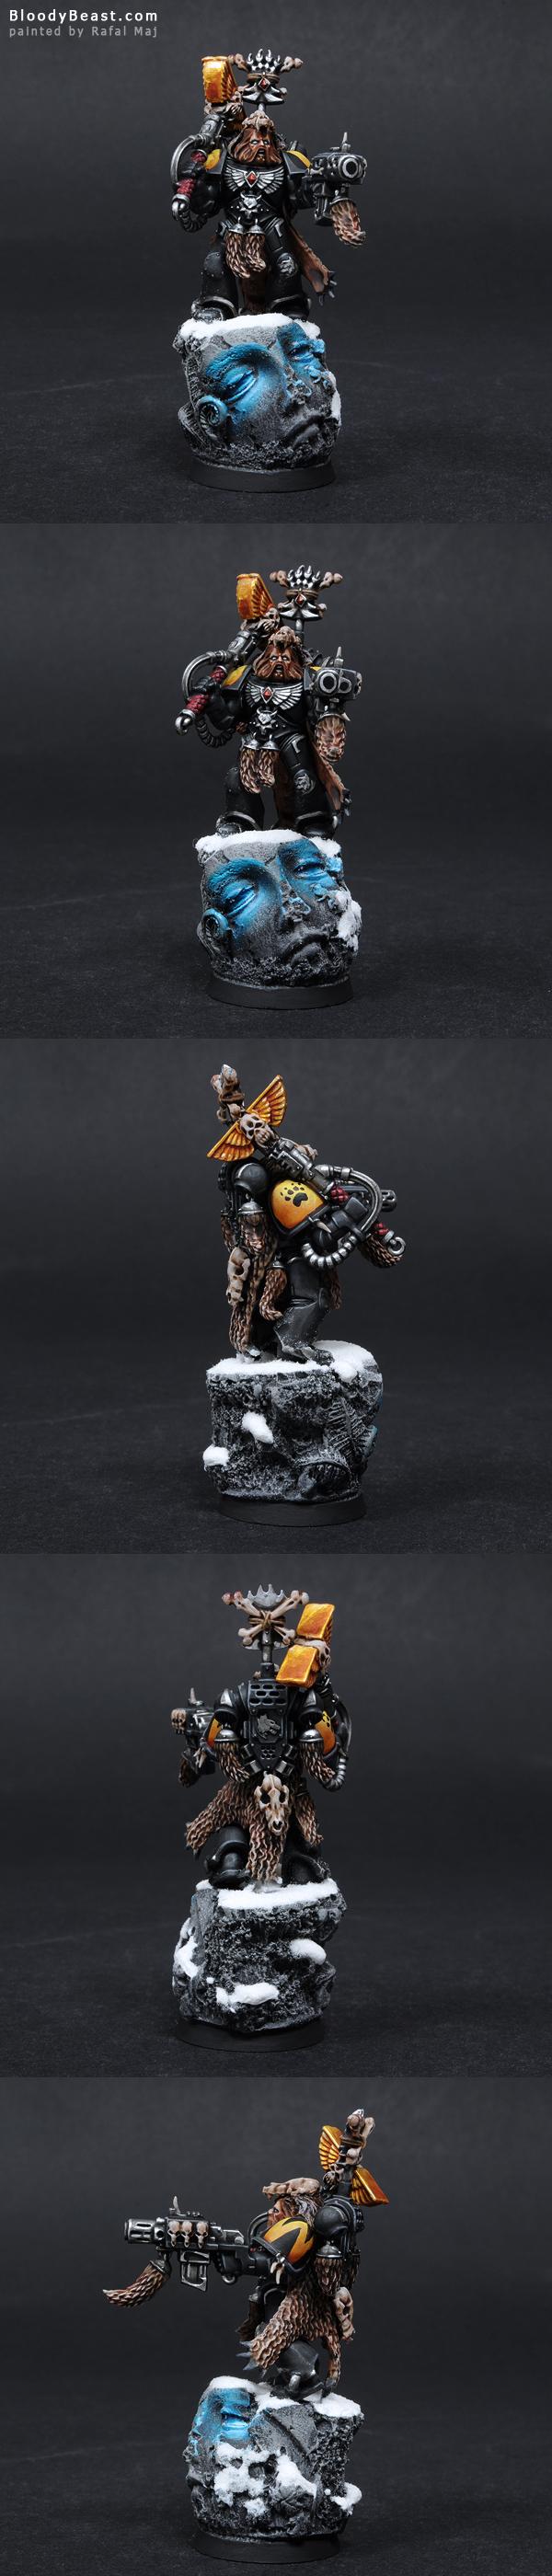 Space Wolves Wolf Priest painted by Rafal Maj (BloodyBeast.com)